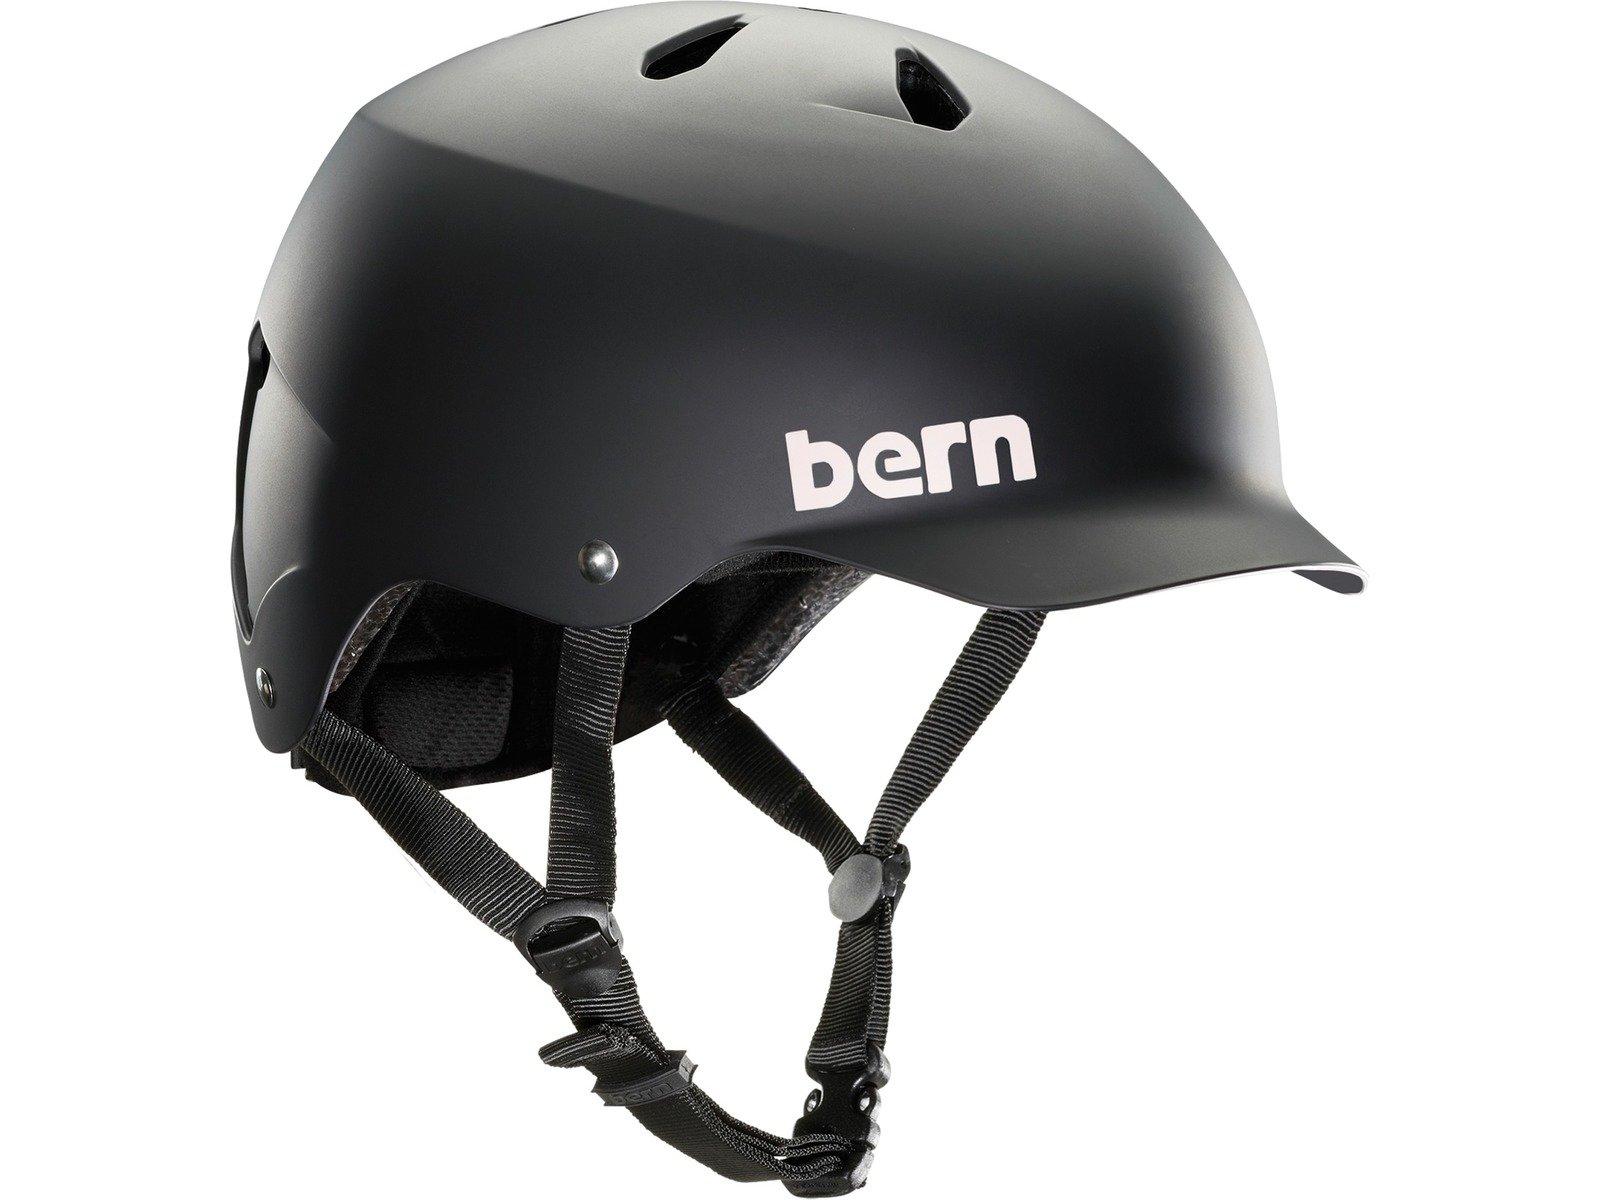 Bern Unlimited Watts EPS Summer Helmet, Matte Black, S/M